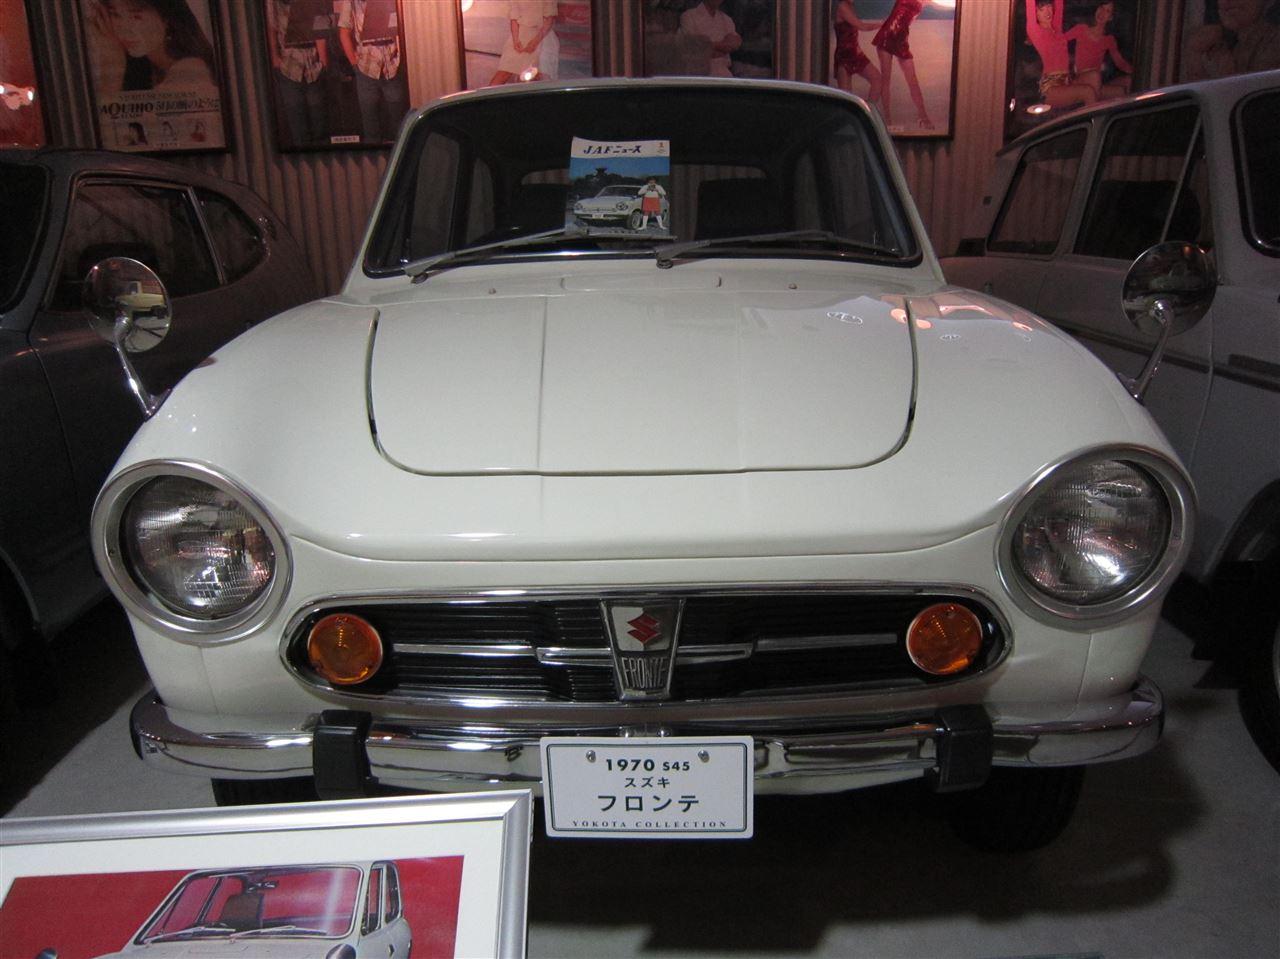 Suzuki Fronte 360 LC10, stare samochody, auta z lat 60, クラシックカー、軽自動車、日本車